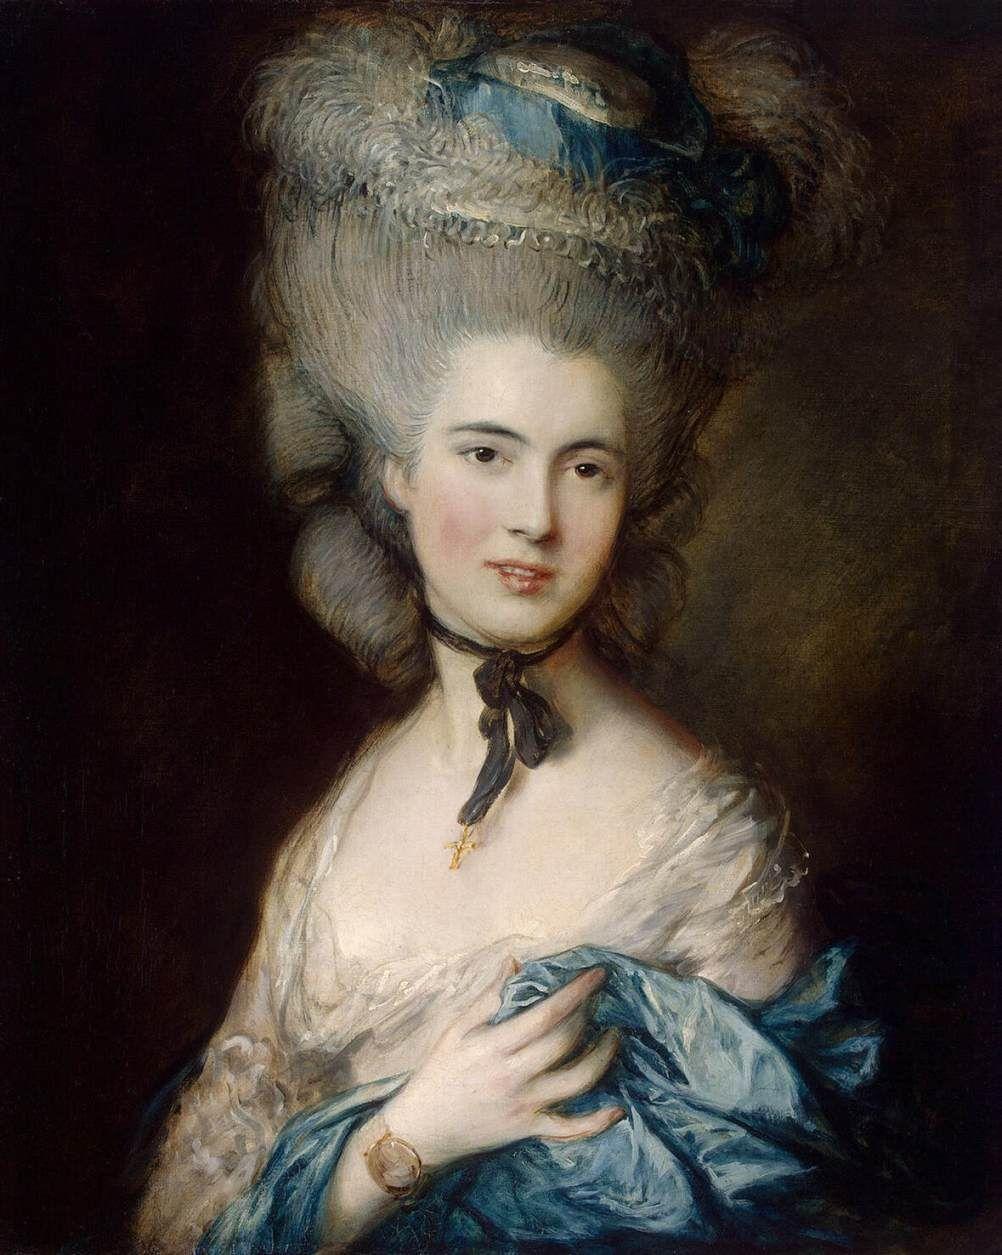 Thomas Gainsborough - Portrait of a Lady in Blue